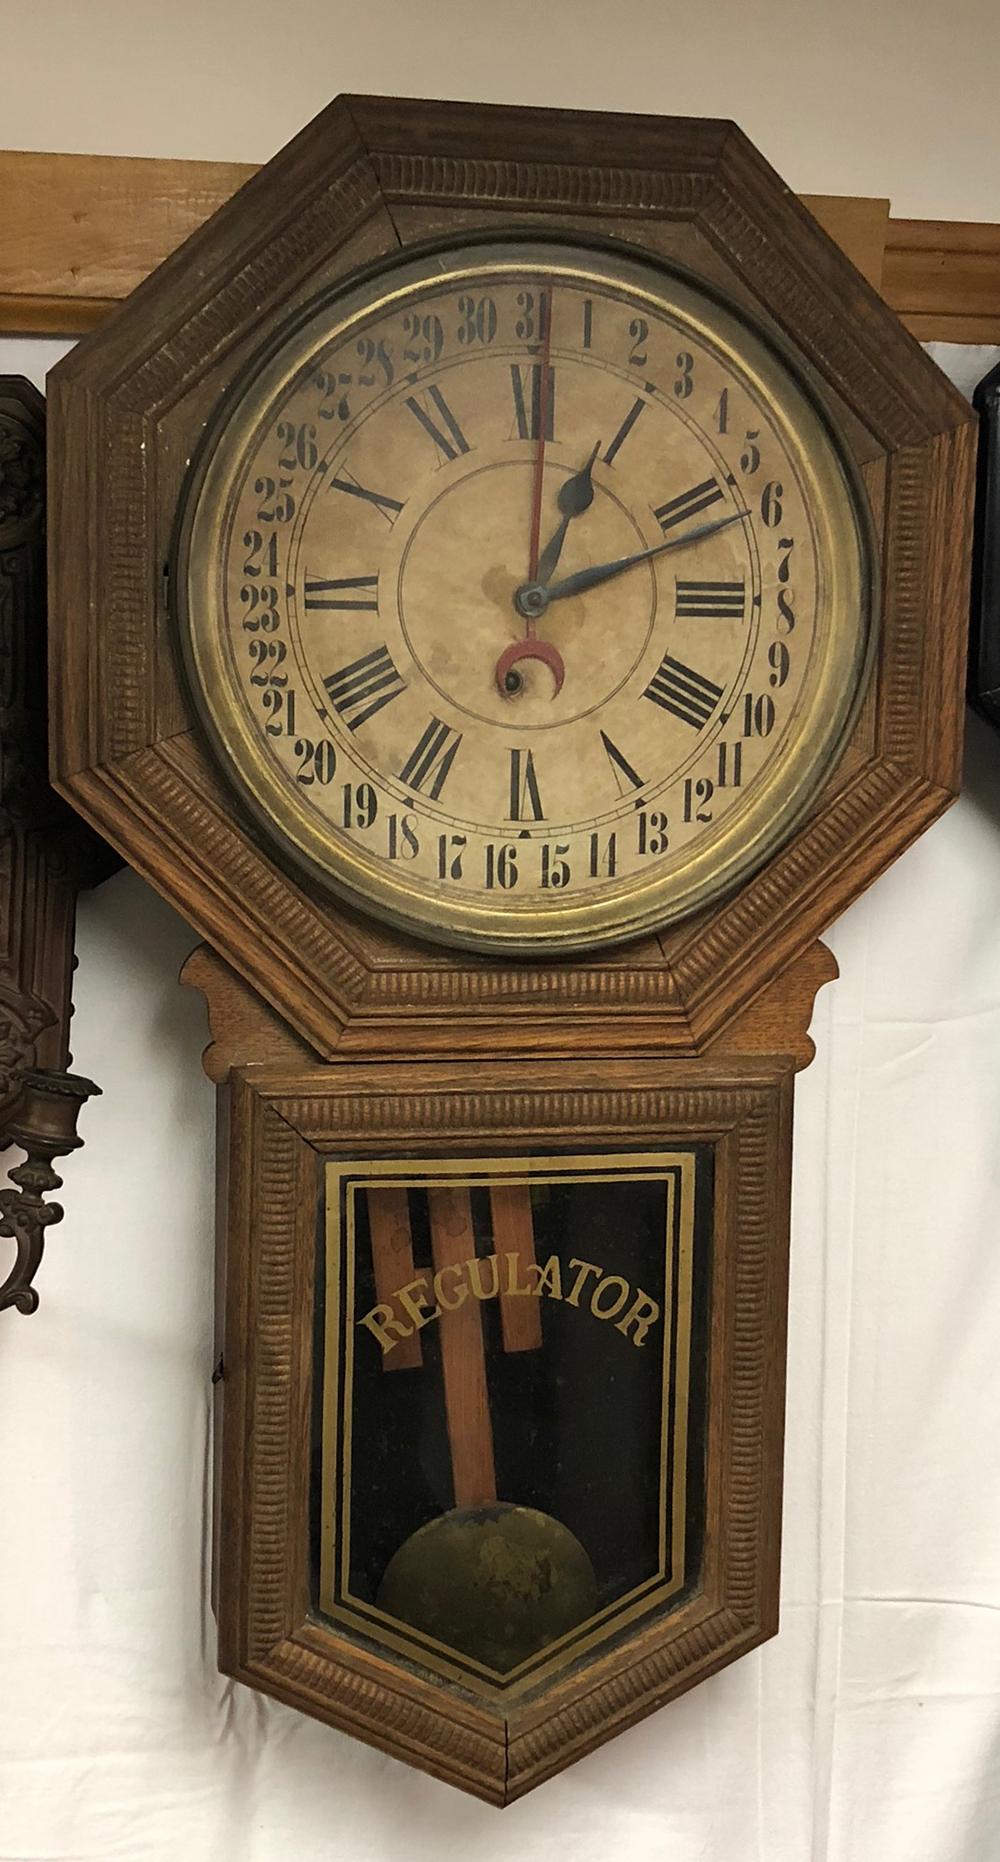 Ingraham Regulator Clock